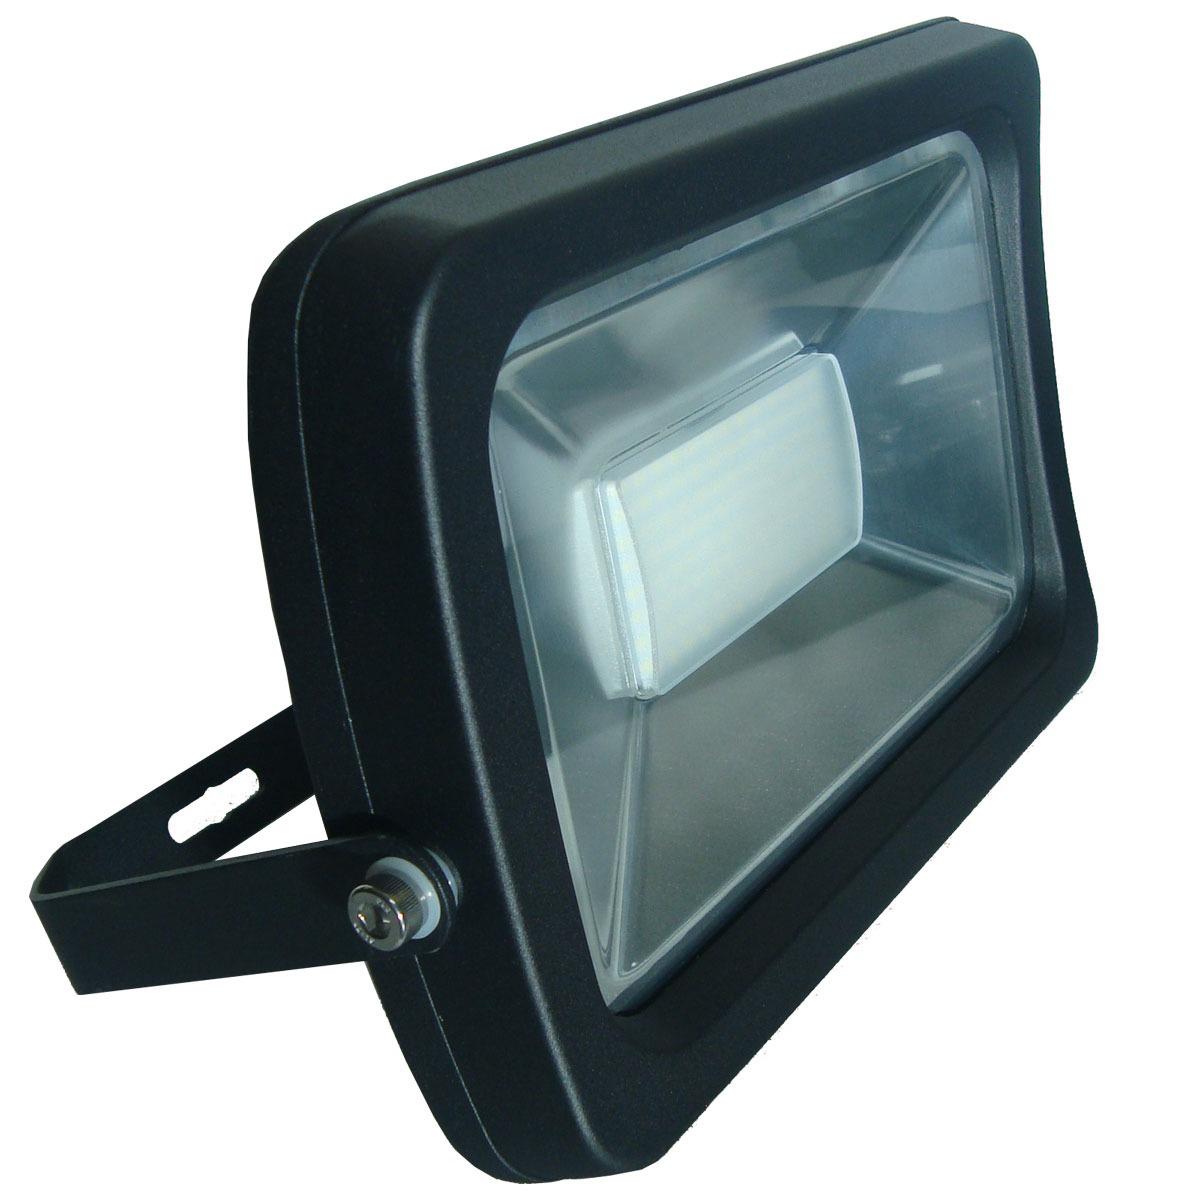 Foco led exterior reflector led exterior 30w ahorra luz Luz led exterior